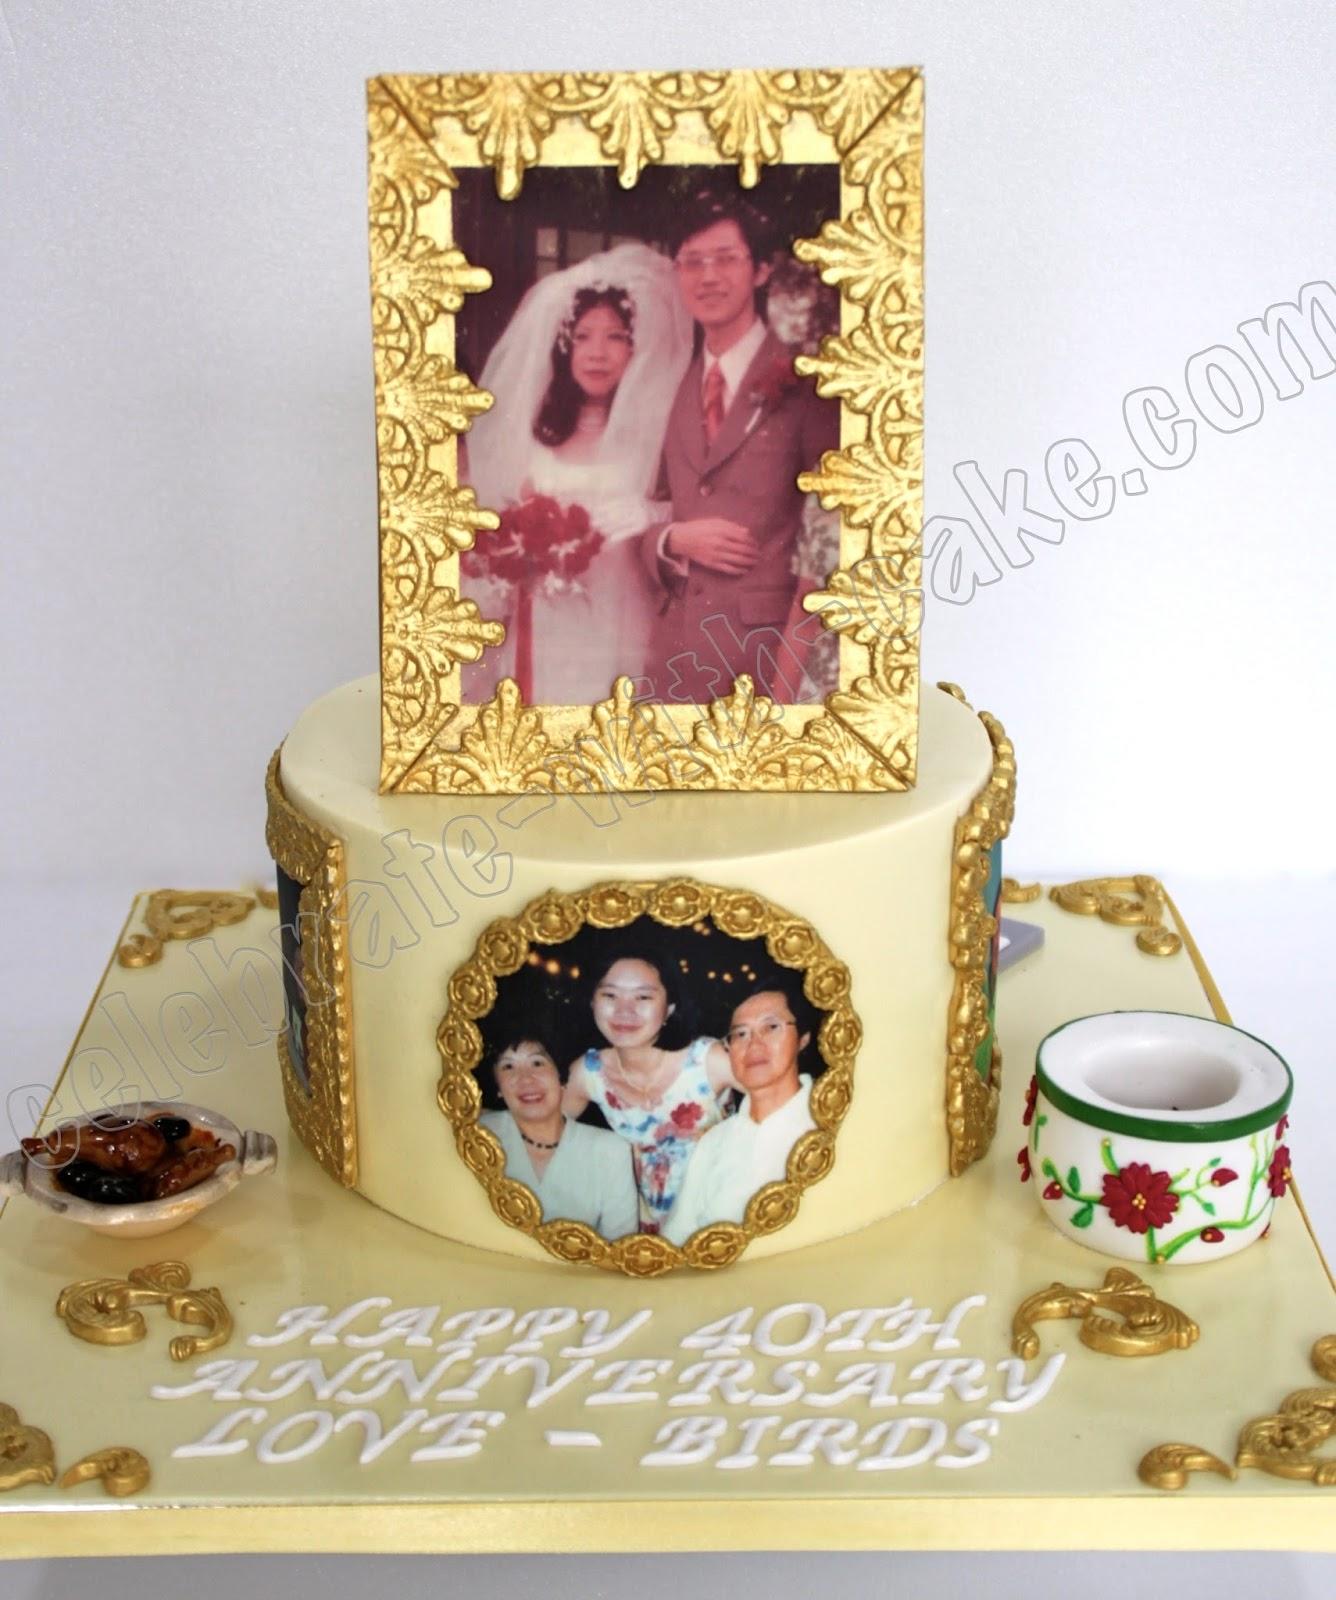 Celebrate with Cake!: Traditional Chinese Wedding Anniversary Cake